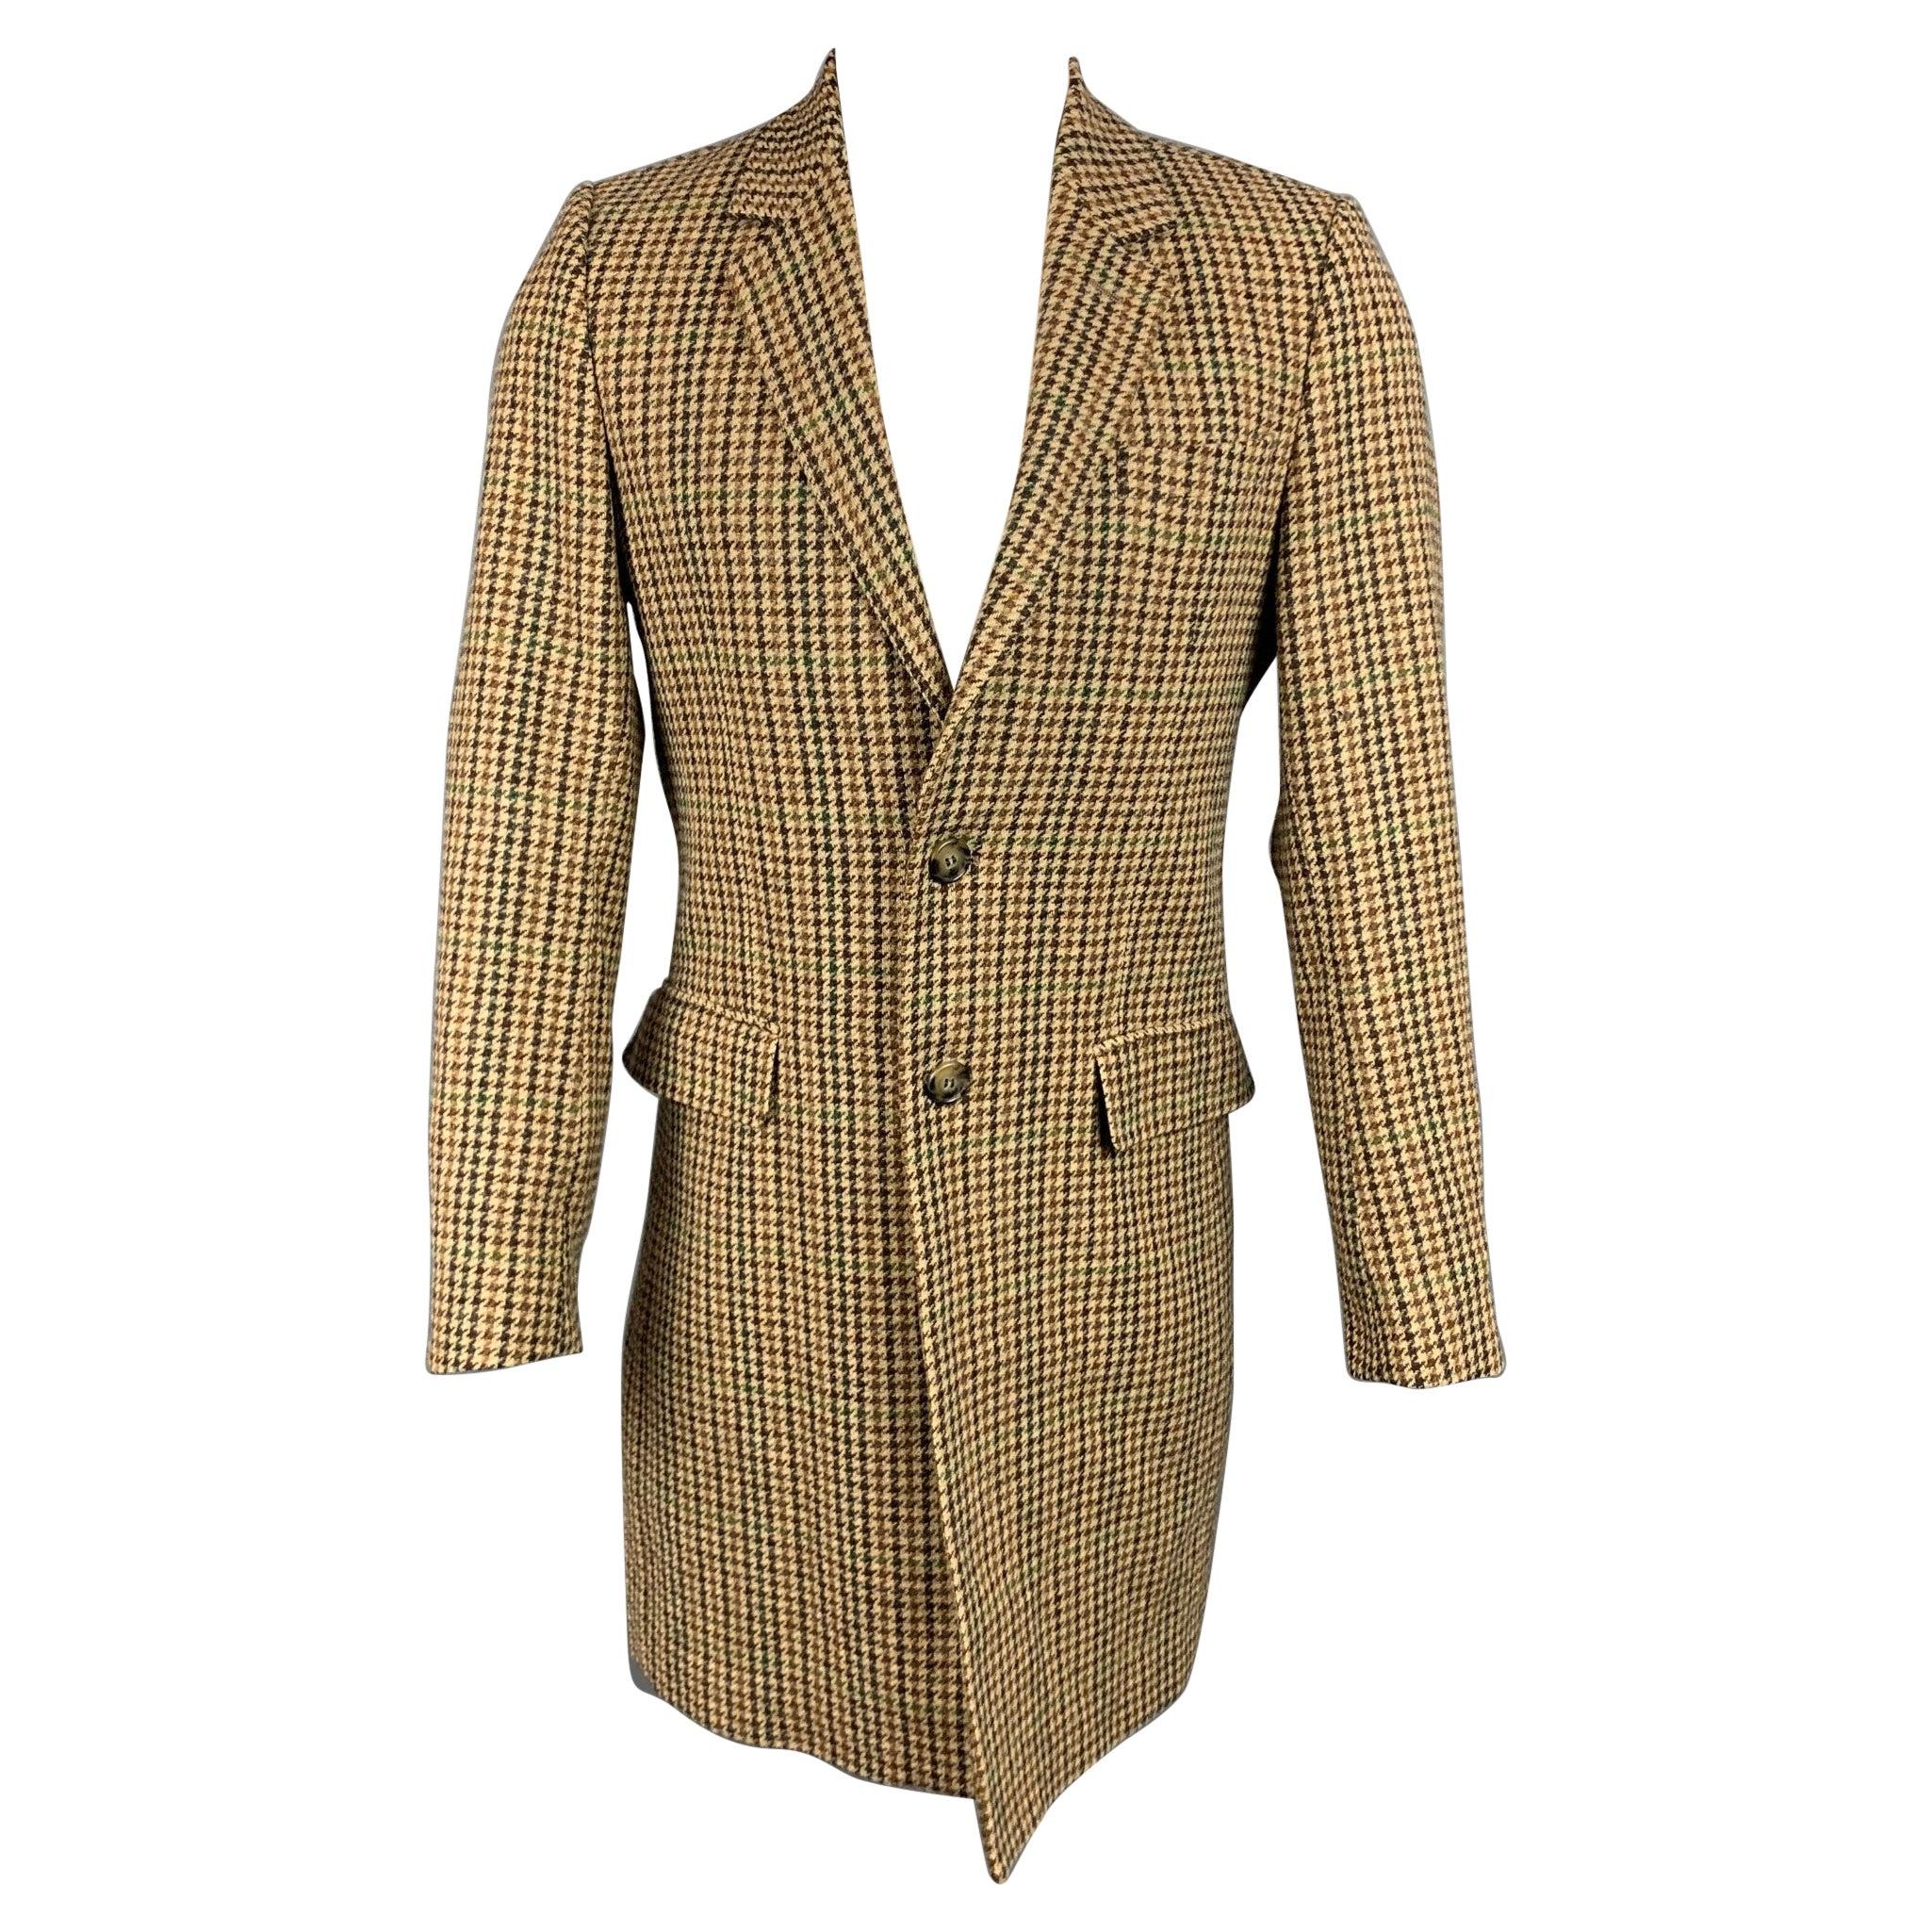 AMI by ALEXANDRE MATTIUSSI Size 40 Tan & Brown Plaid Wool Notch Lapel Coat